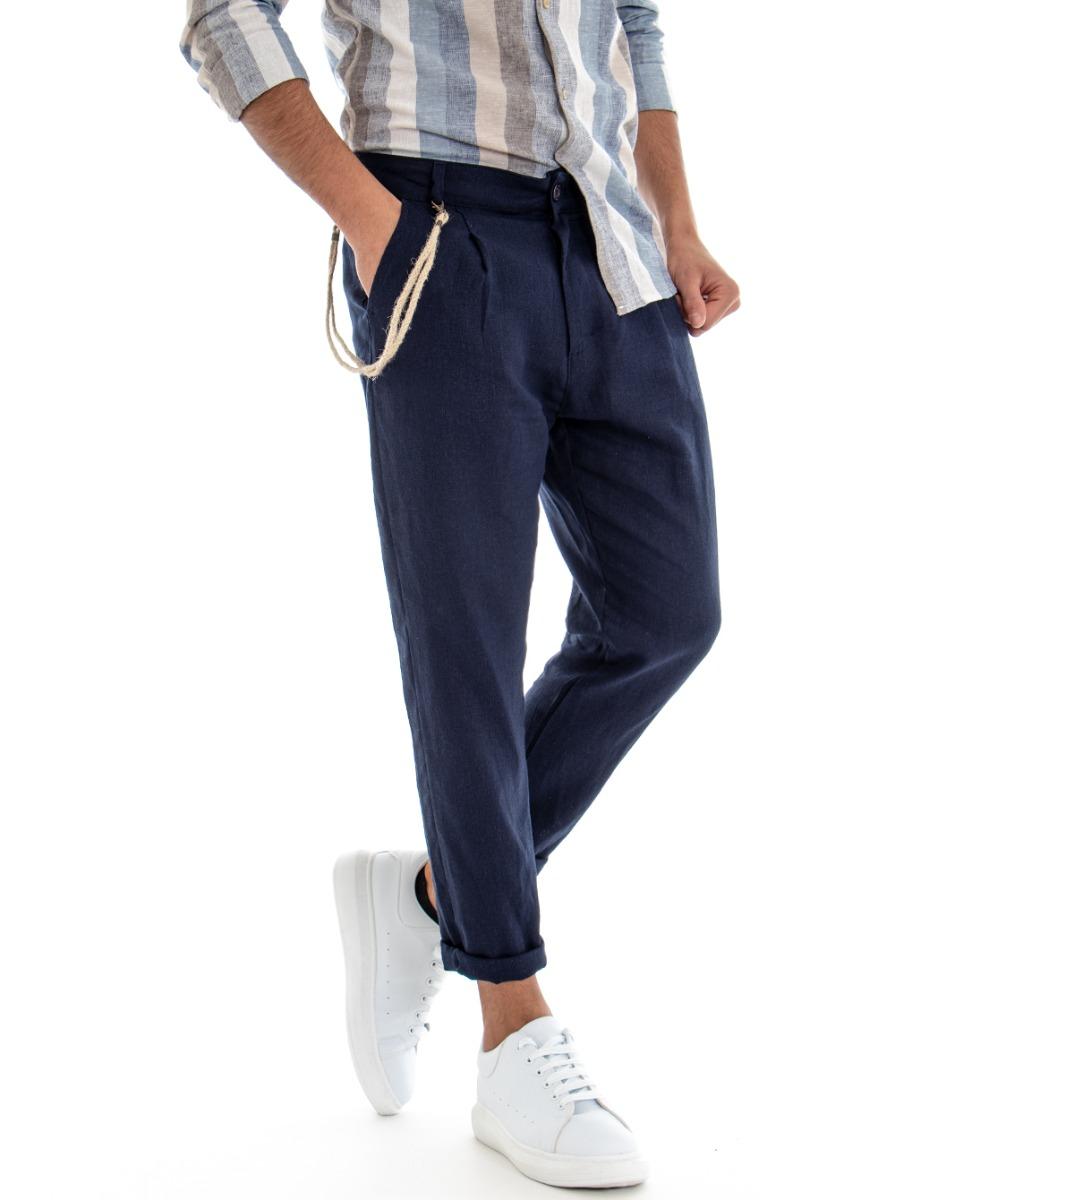 Pantalone-Uomo-Tinta-Unita-Blu-Tasca-America-Cavallo-Basso-Misto-Lino-Viscosa miniatura 3